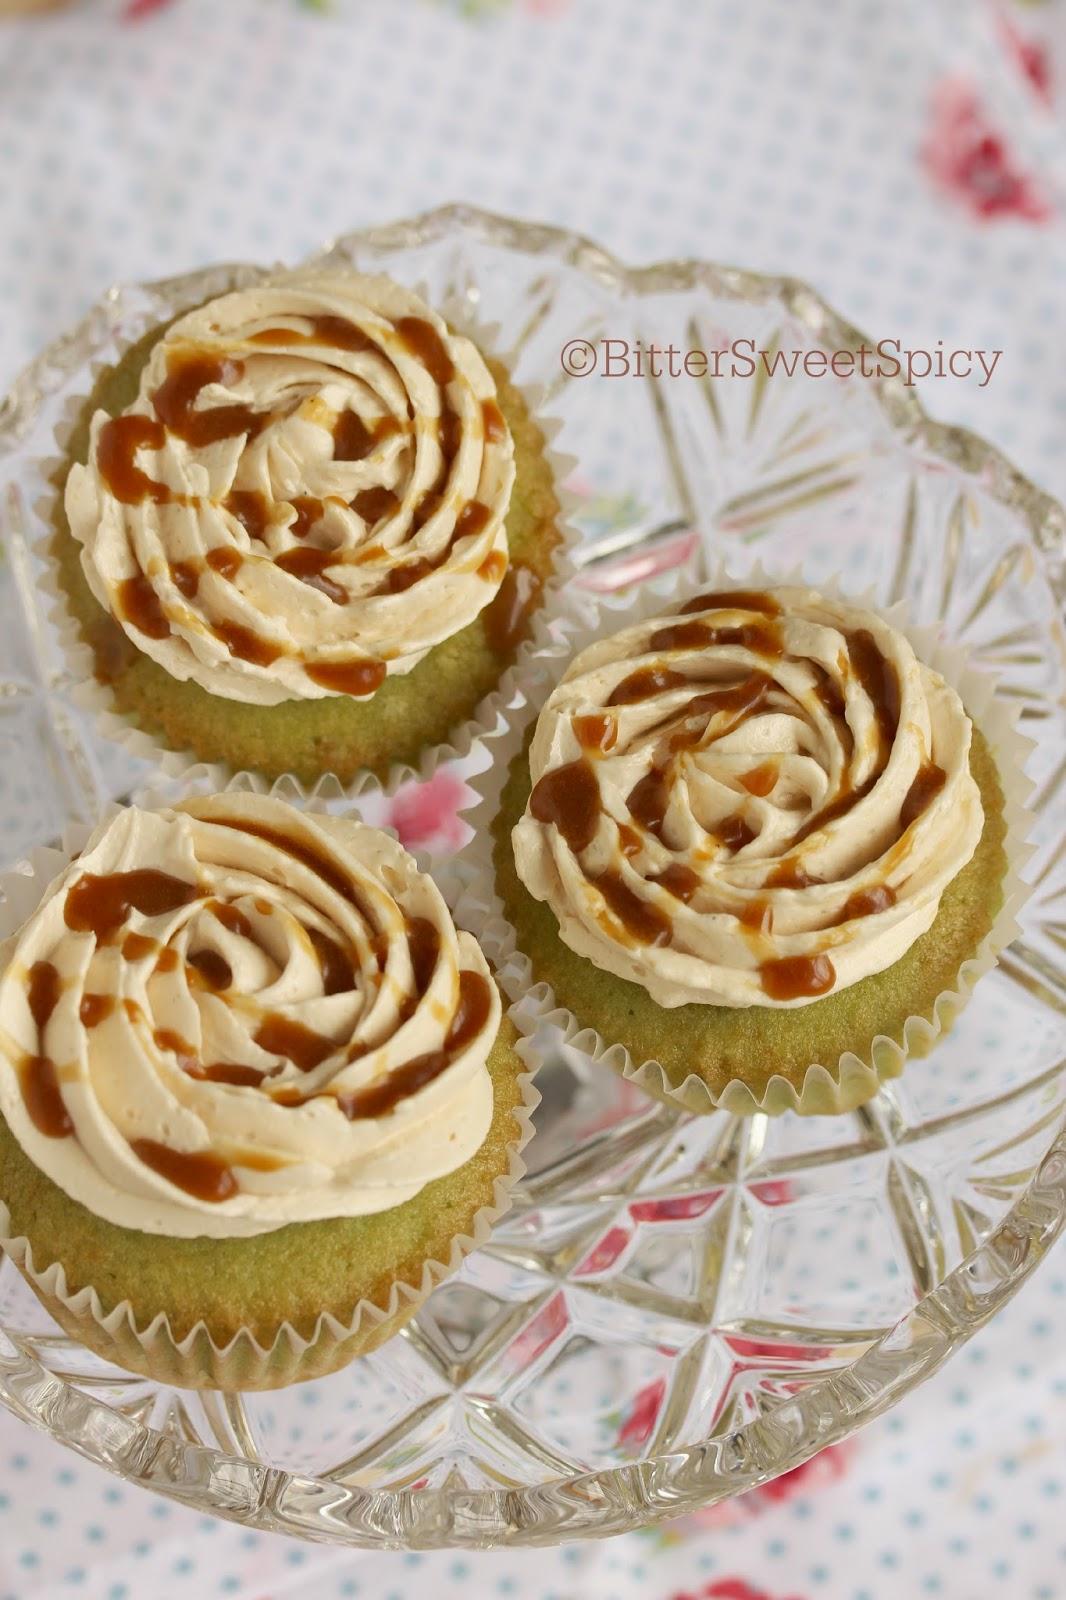 Bittersweetspicy Pandan Cupcakes With Gula Melaka Frosting